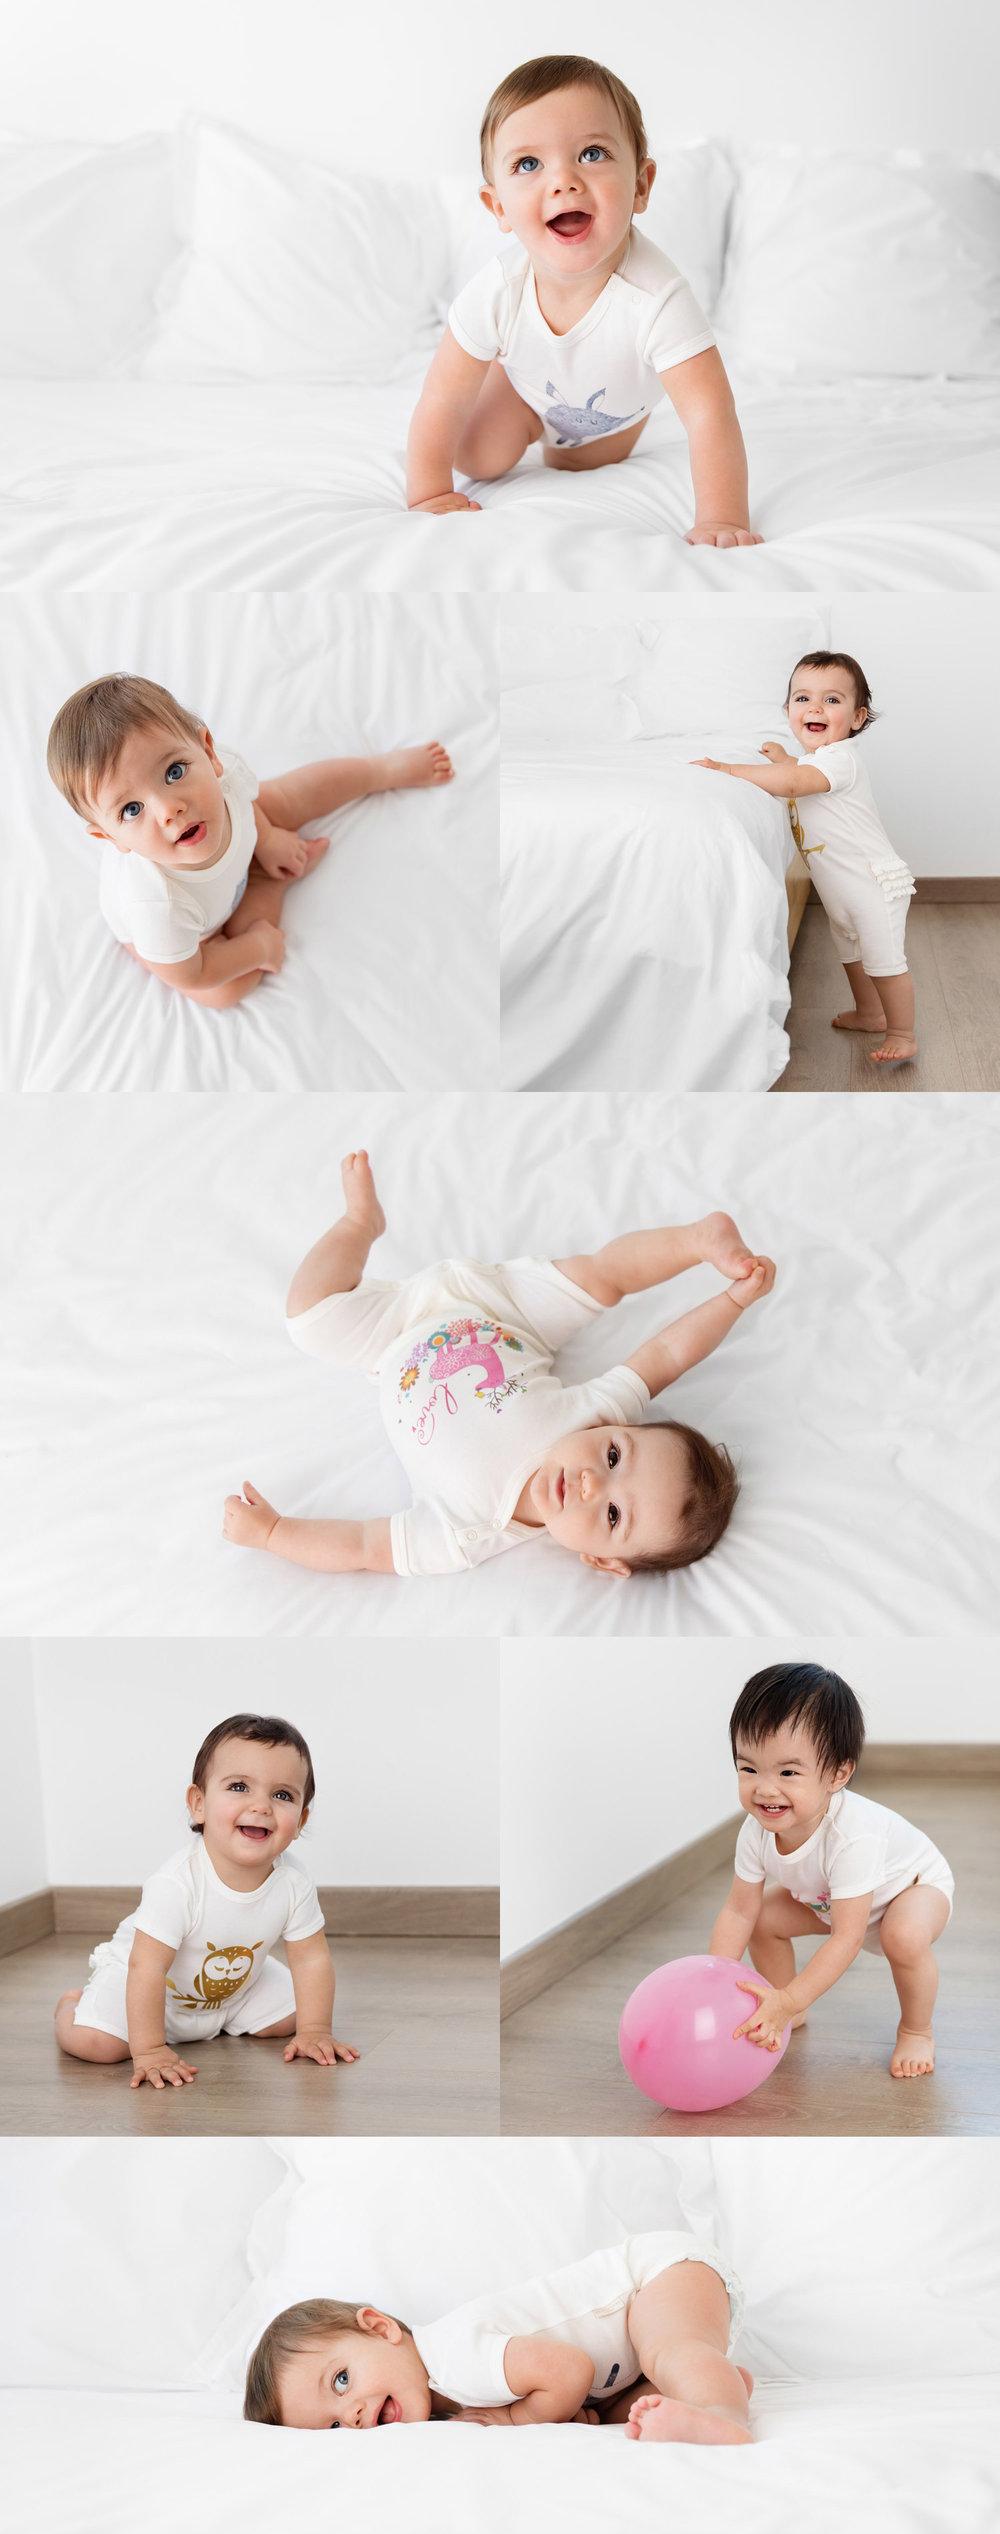 Cute babies wearing onesies by baby fashion photographer Lisa Tichane